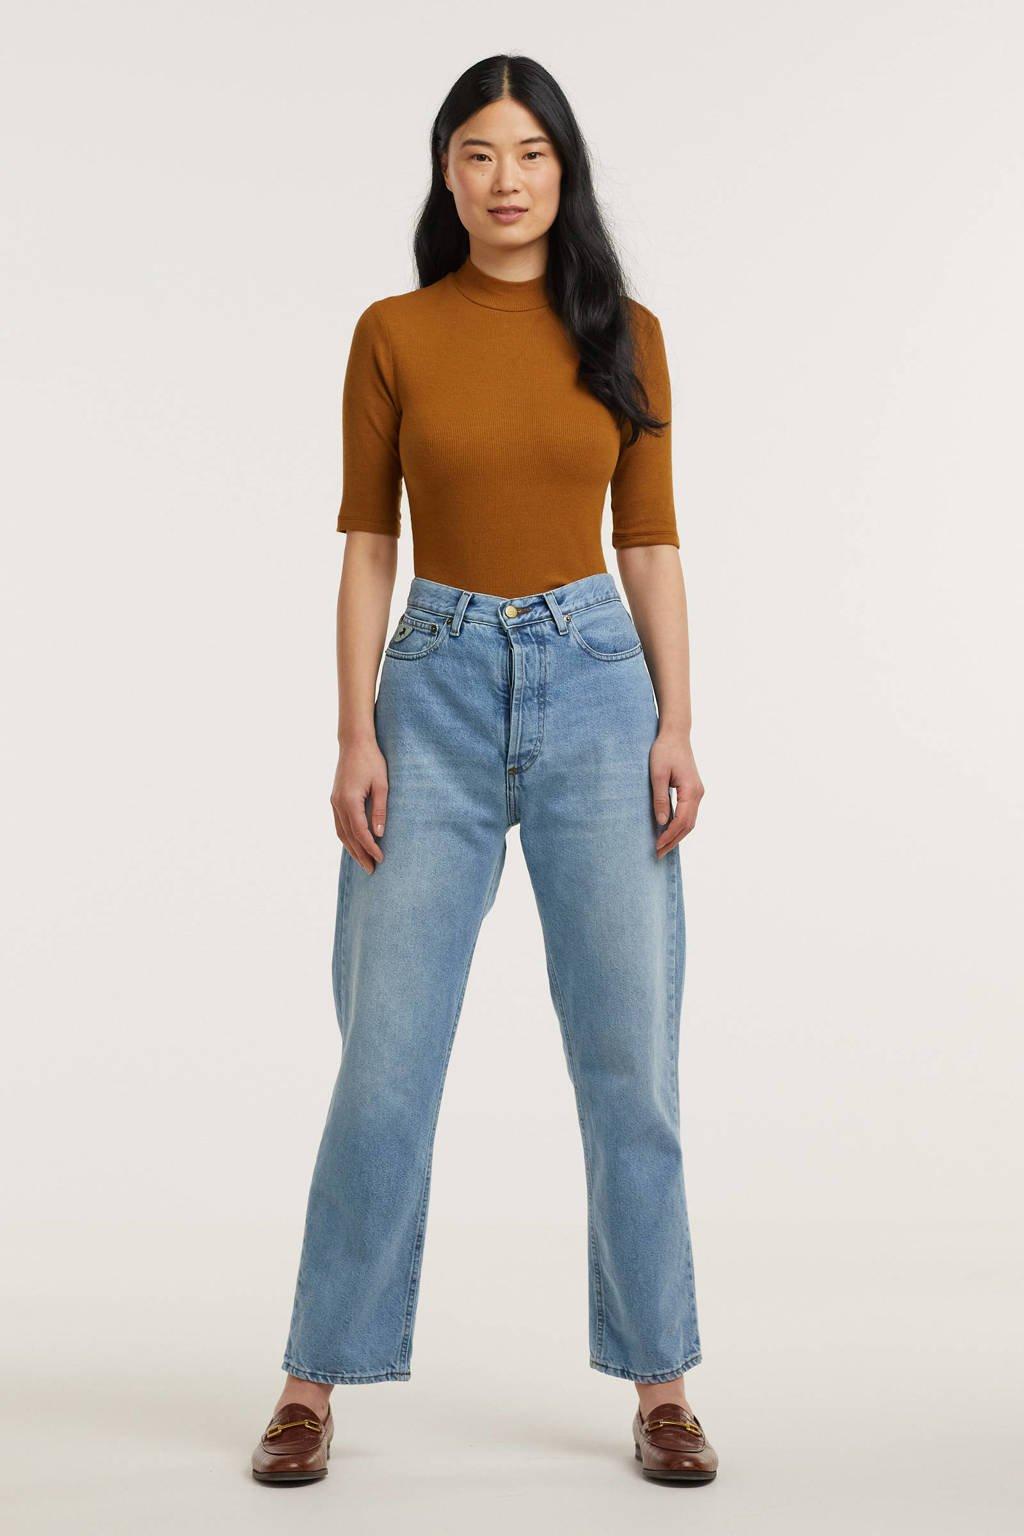 Lois high waist mom jeans 2666 Dana 6360 Kape Daddy bio double stone, Bio Double Stone